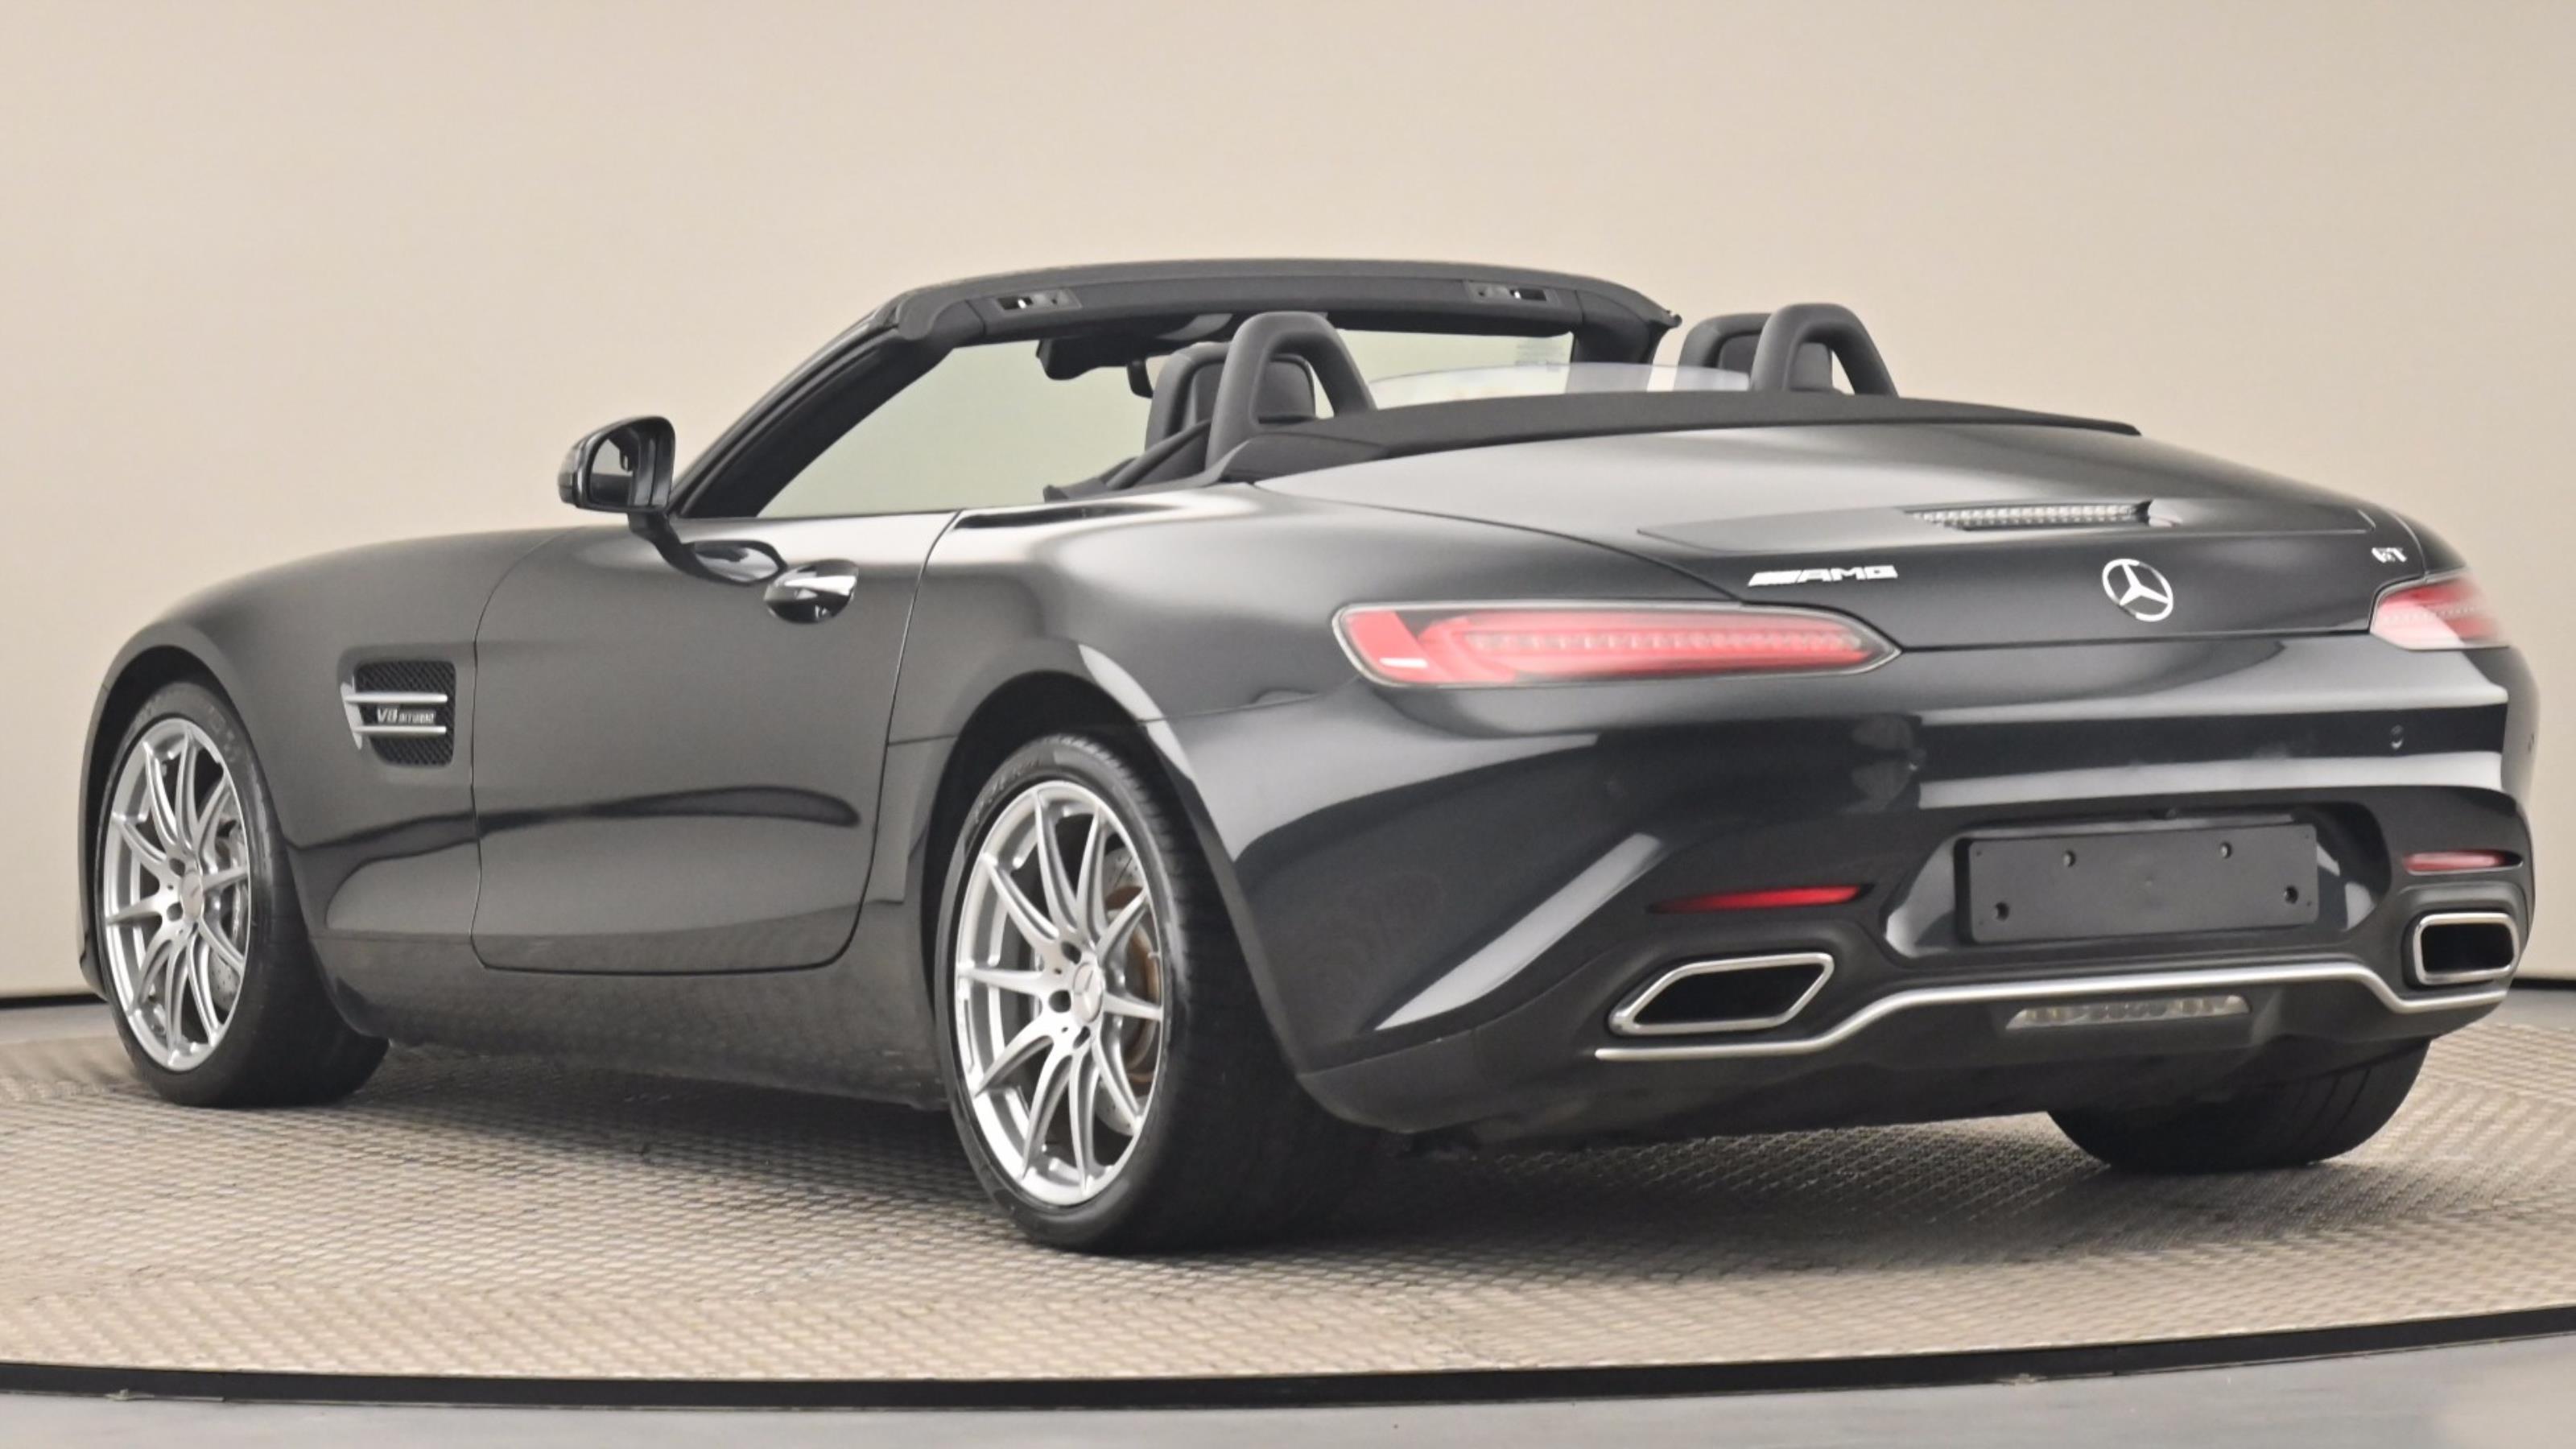 Used 2018 Mercedes-Benz AMG GT GT Premium 2dr Auto BLACK at Saxton4x4